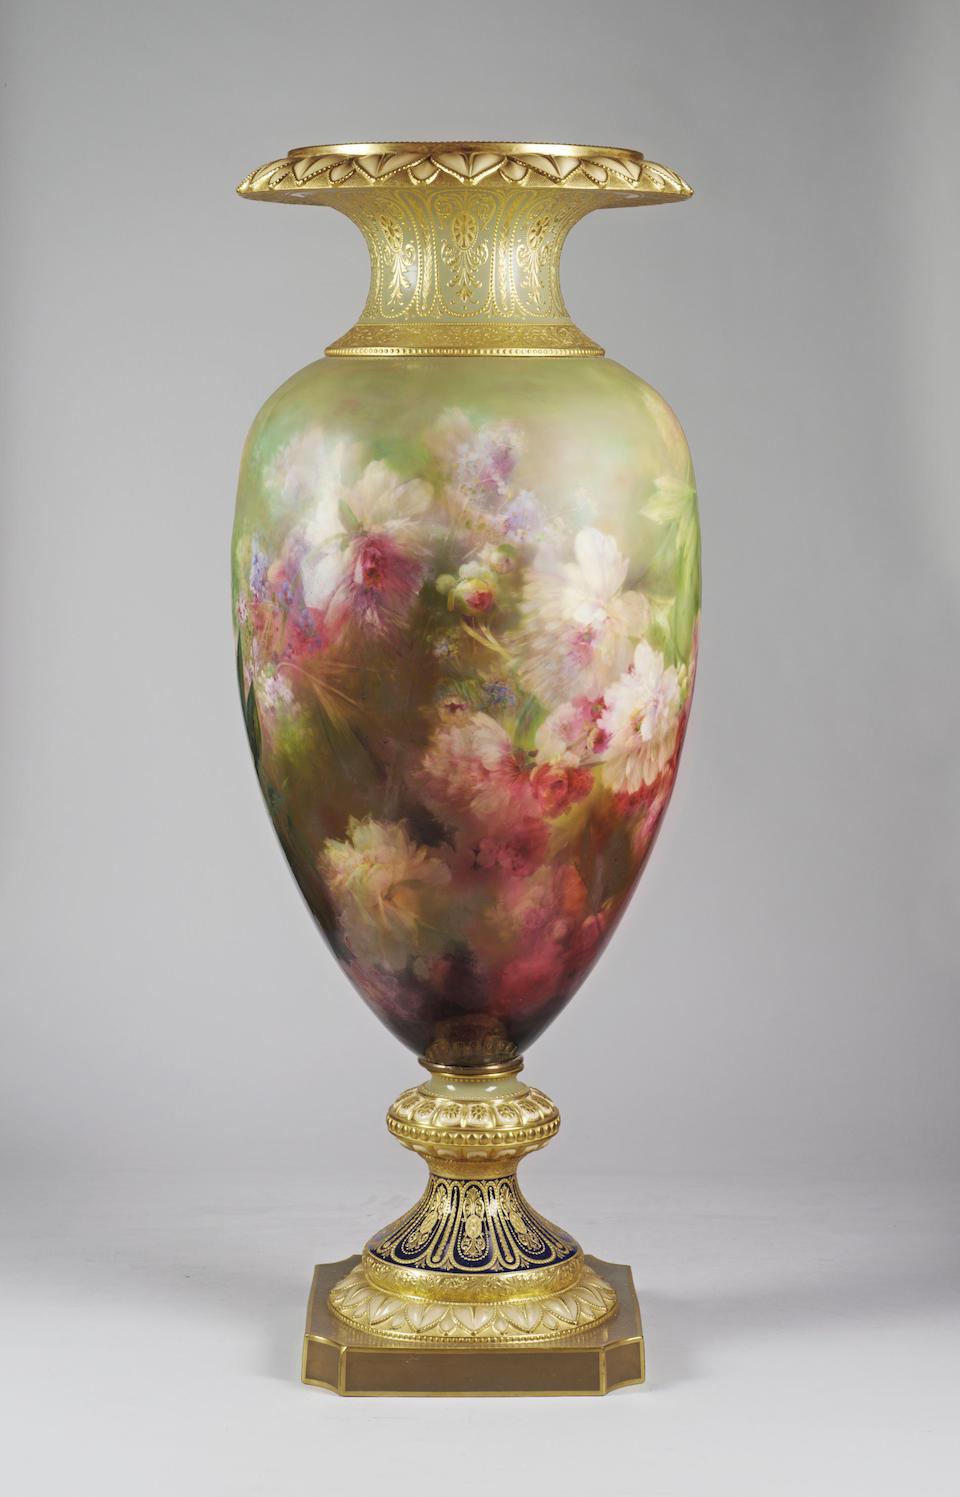 Burslem Items A Magnificent Burslem Exhibition Vase (S.R) (see Burslem Book)